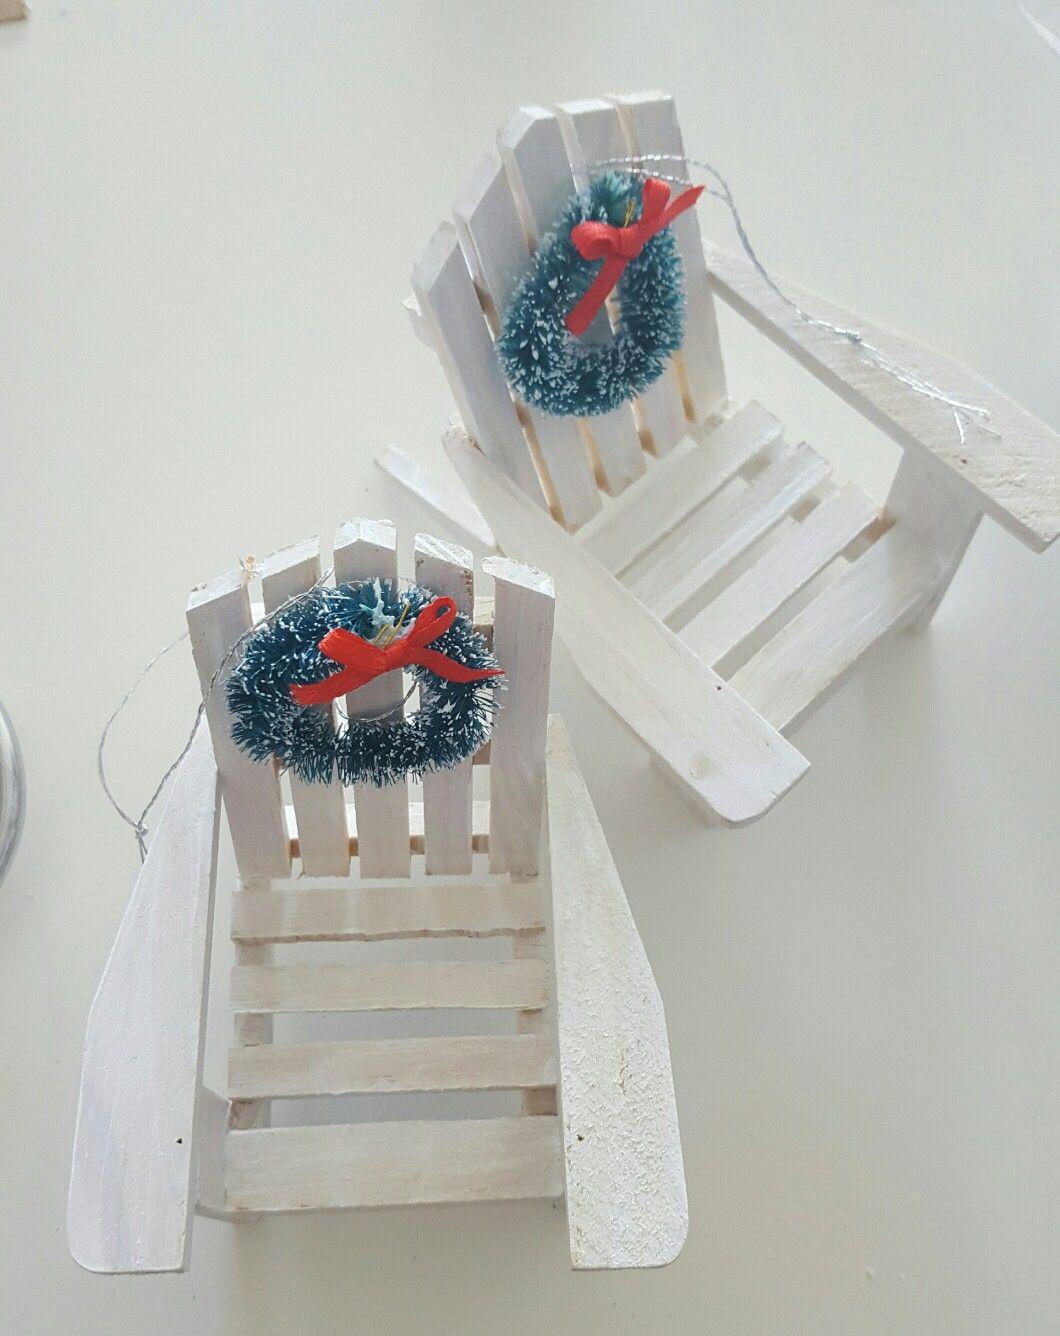 Diy Mini Beach Chair Ornaments For My Costal Christmas Tree